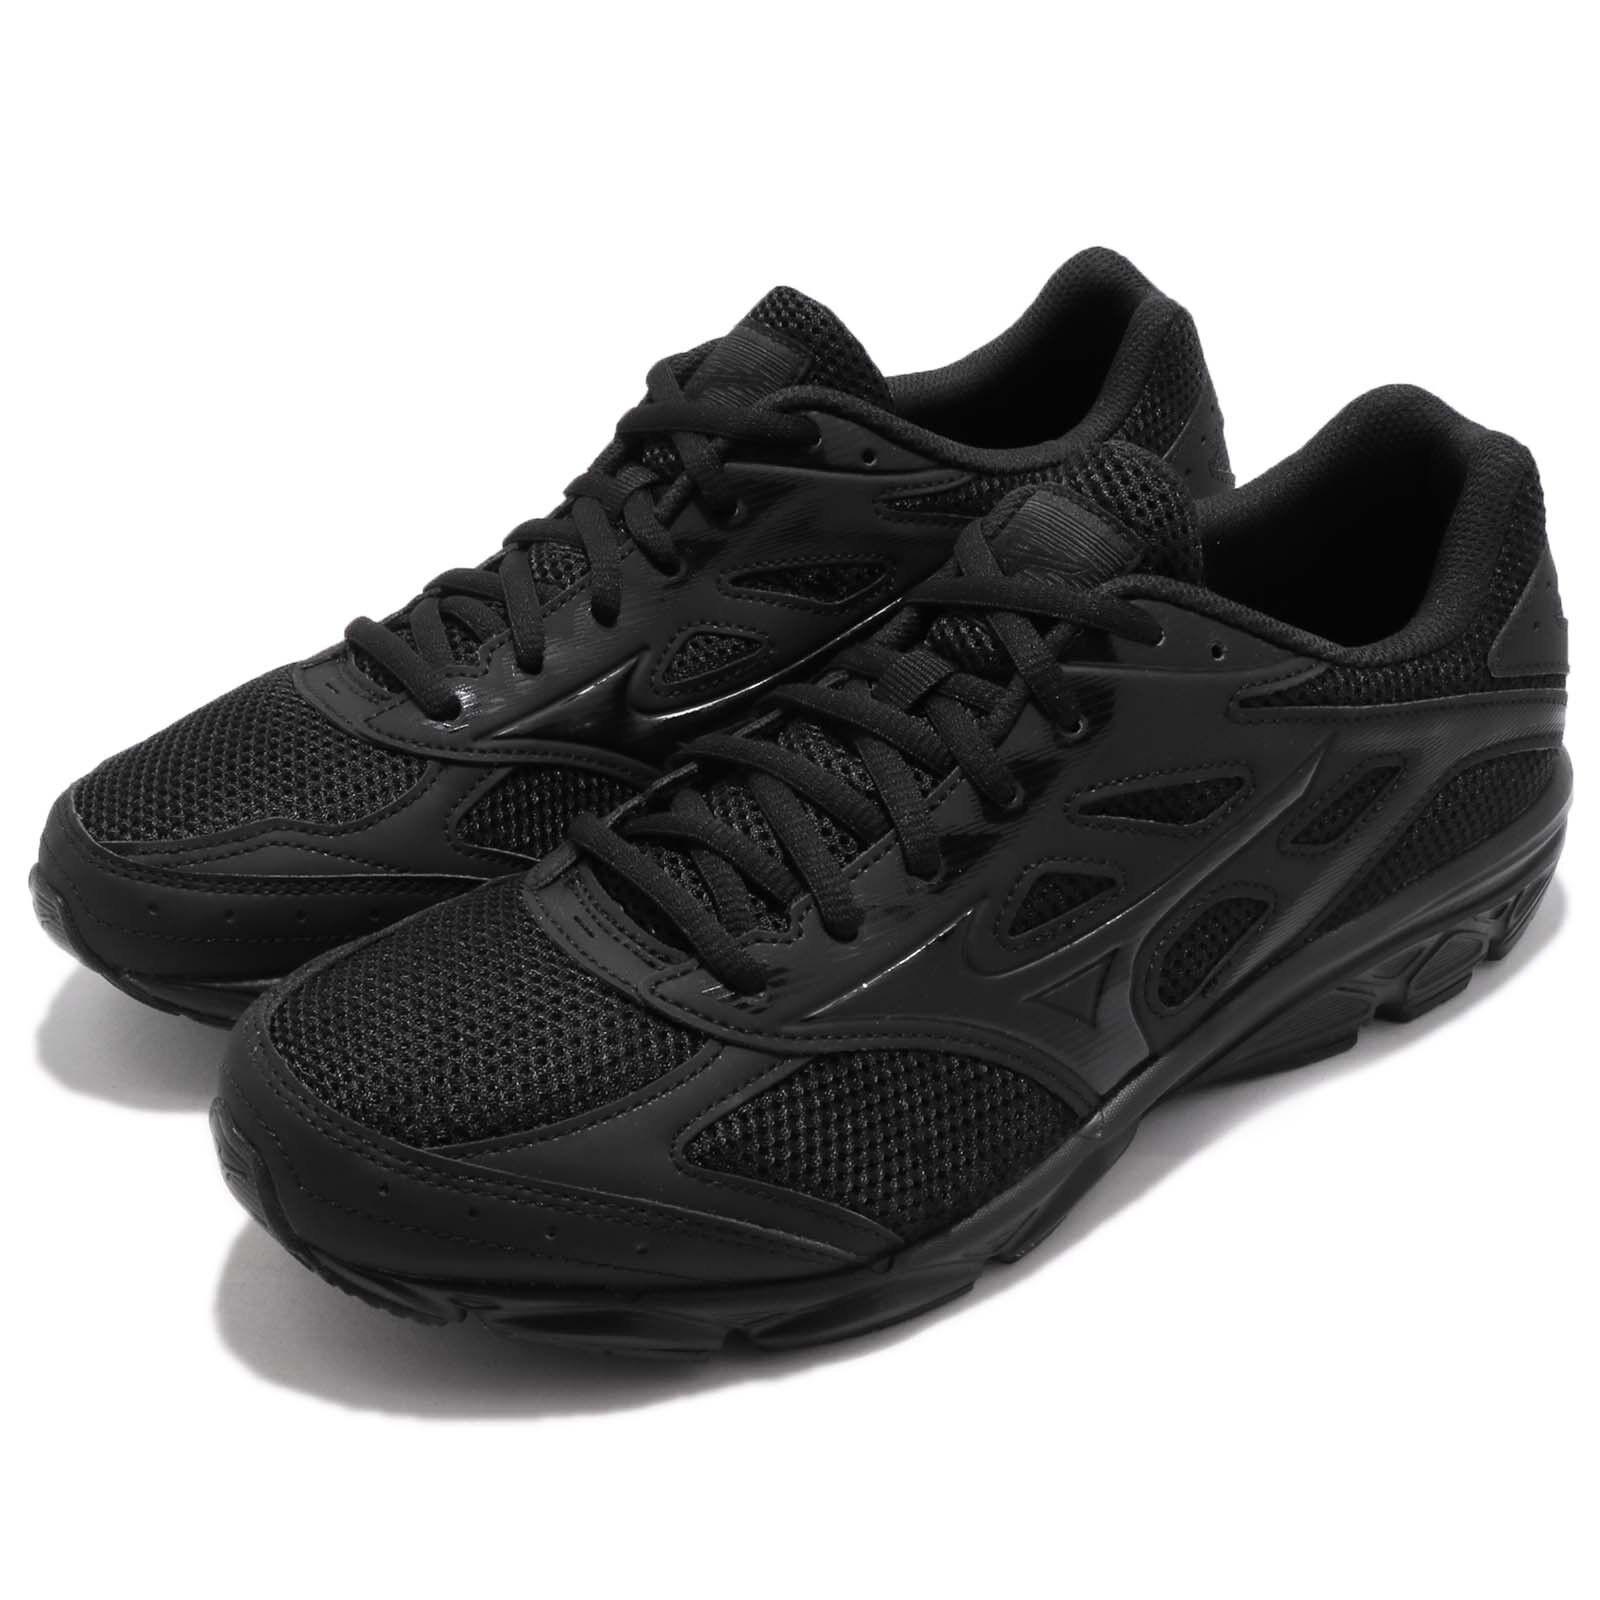 Mizuno Maximizer 21 Triple nero Men Training scarpe scarpe  da ginnastica K1GA1902 -09  Offriamo vari marchi famosi